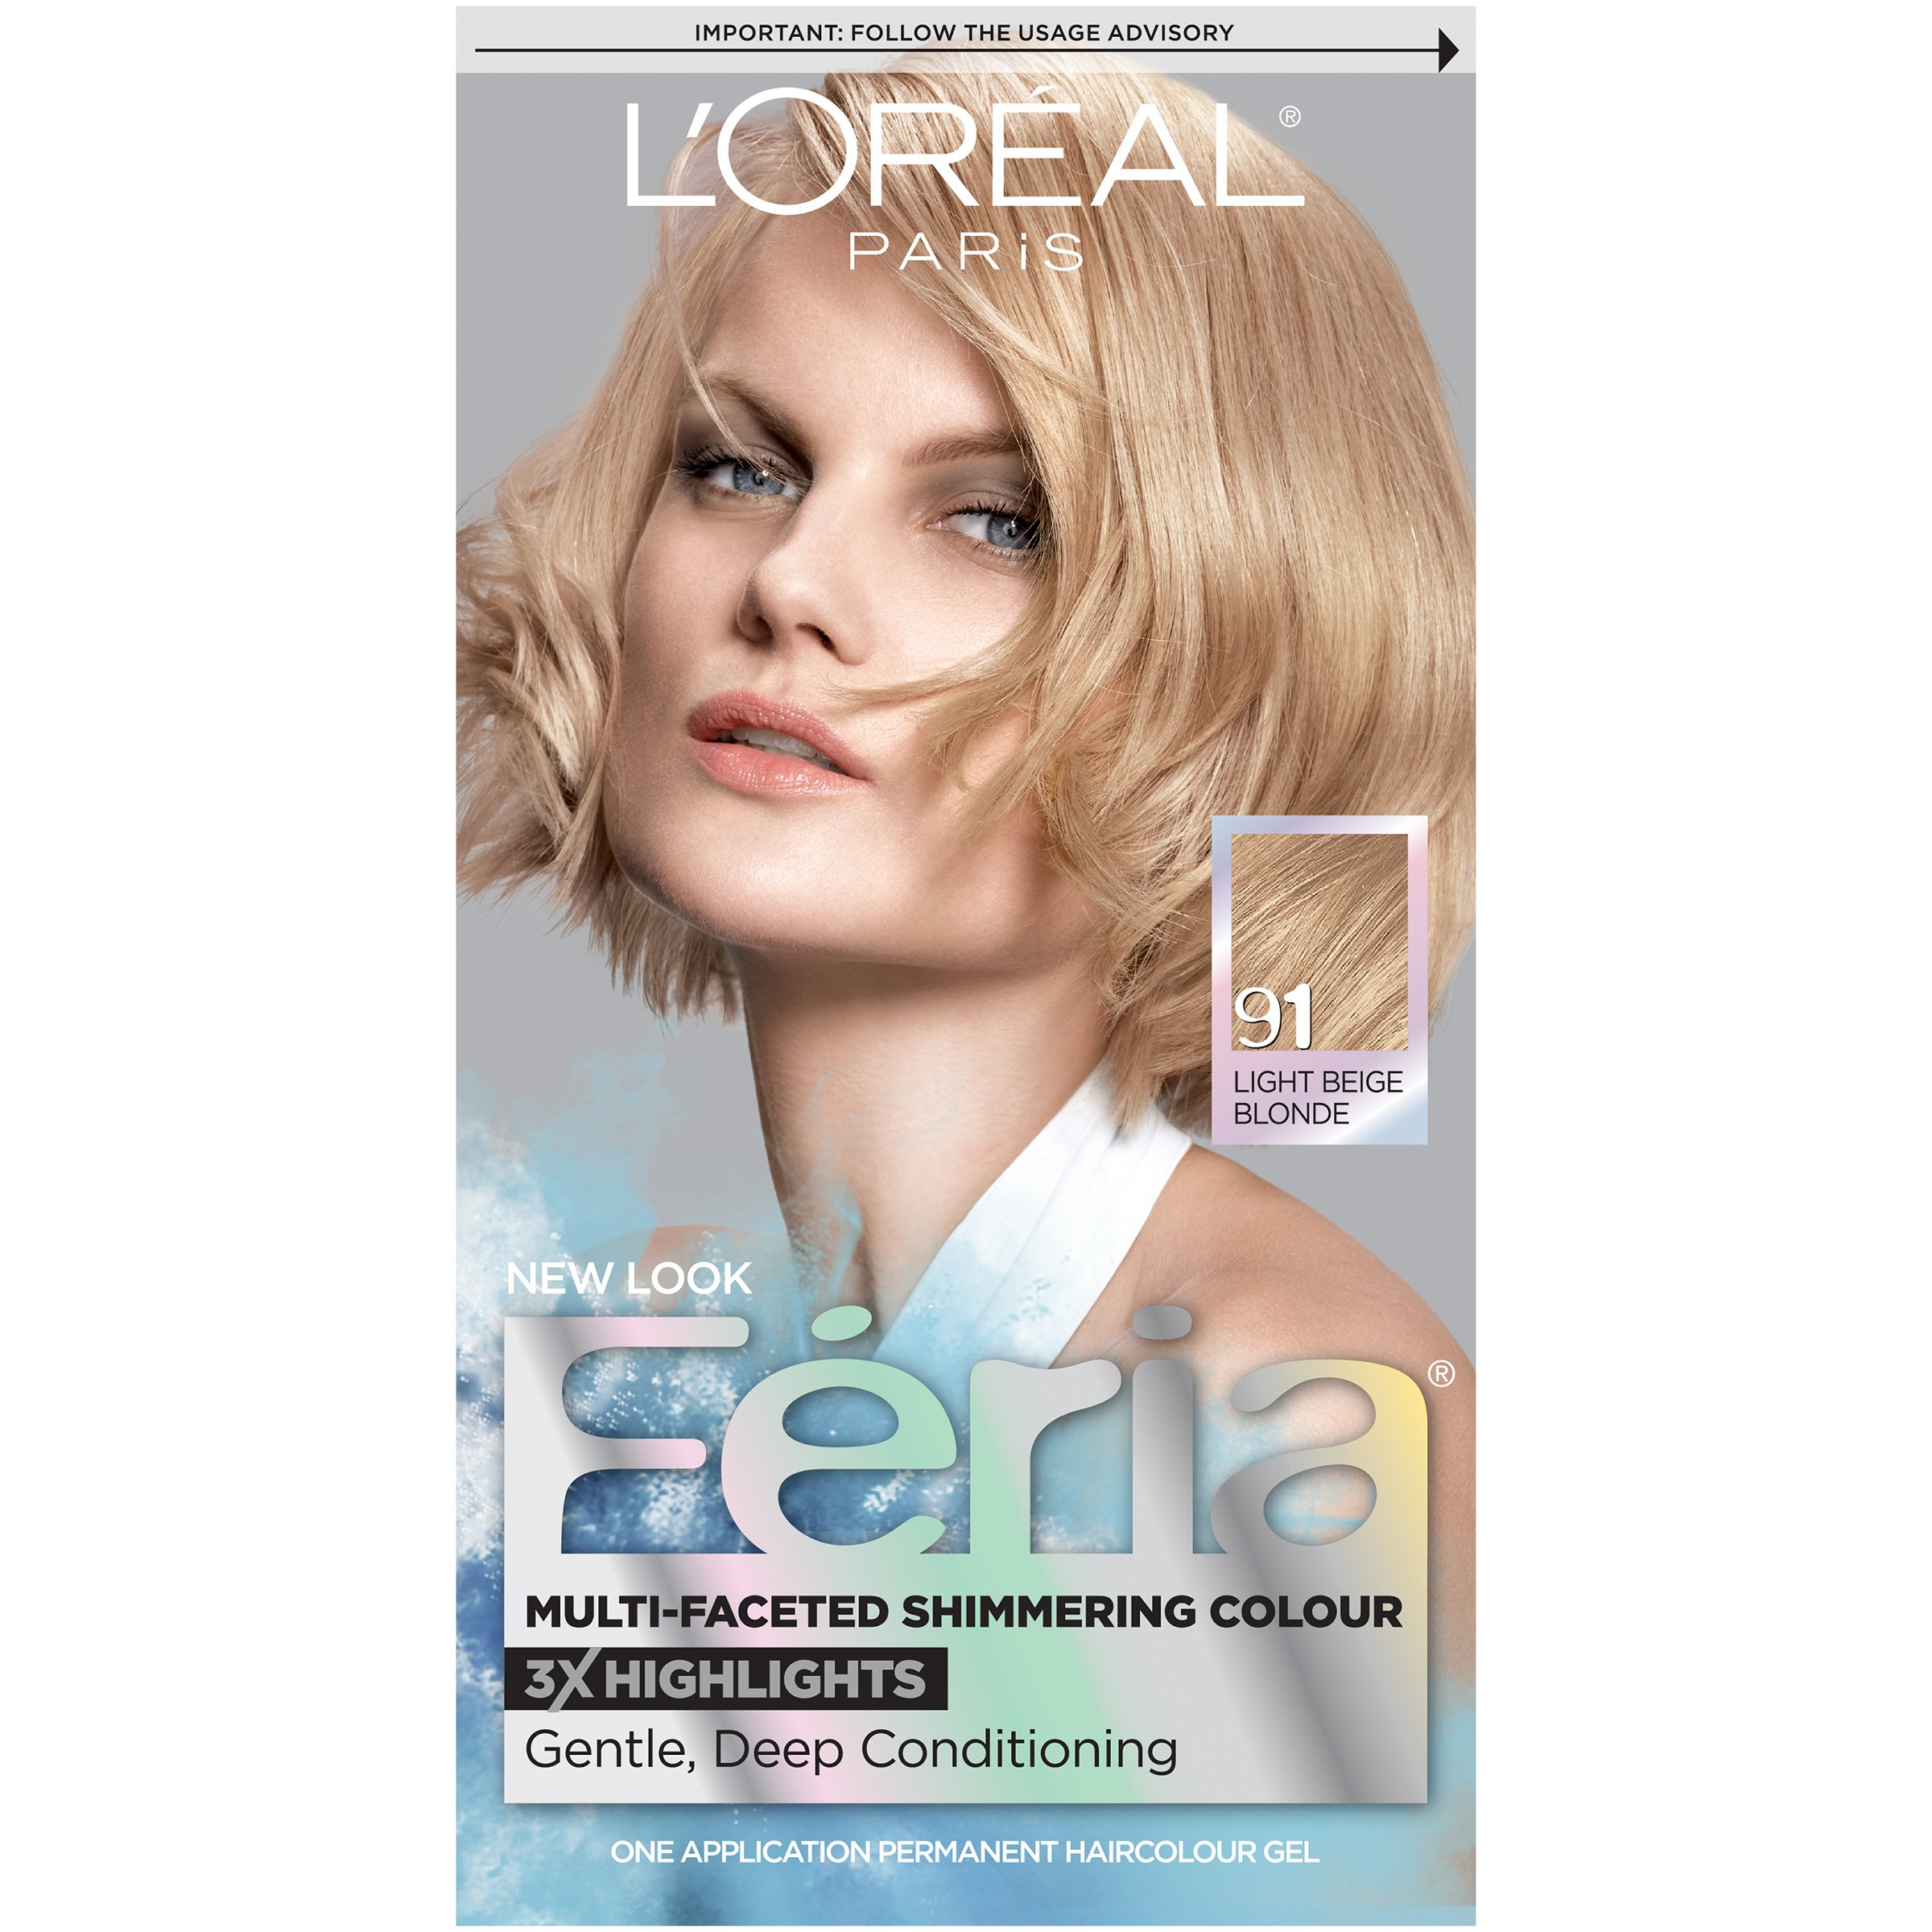 Amazon loral paris feria permanent hair color 100 pure loral paris feria permanent hair color 91champagne cocktail light beige blonde solutioingenieria Gallery